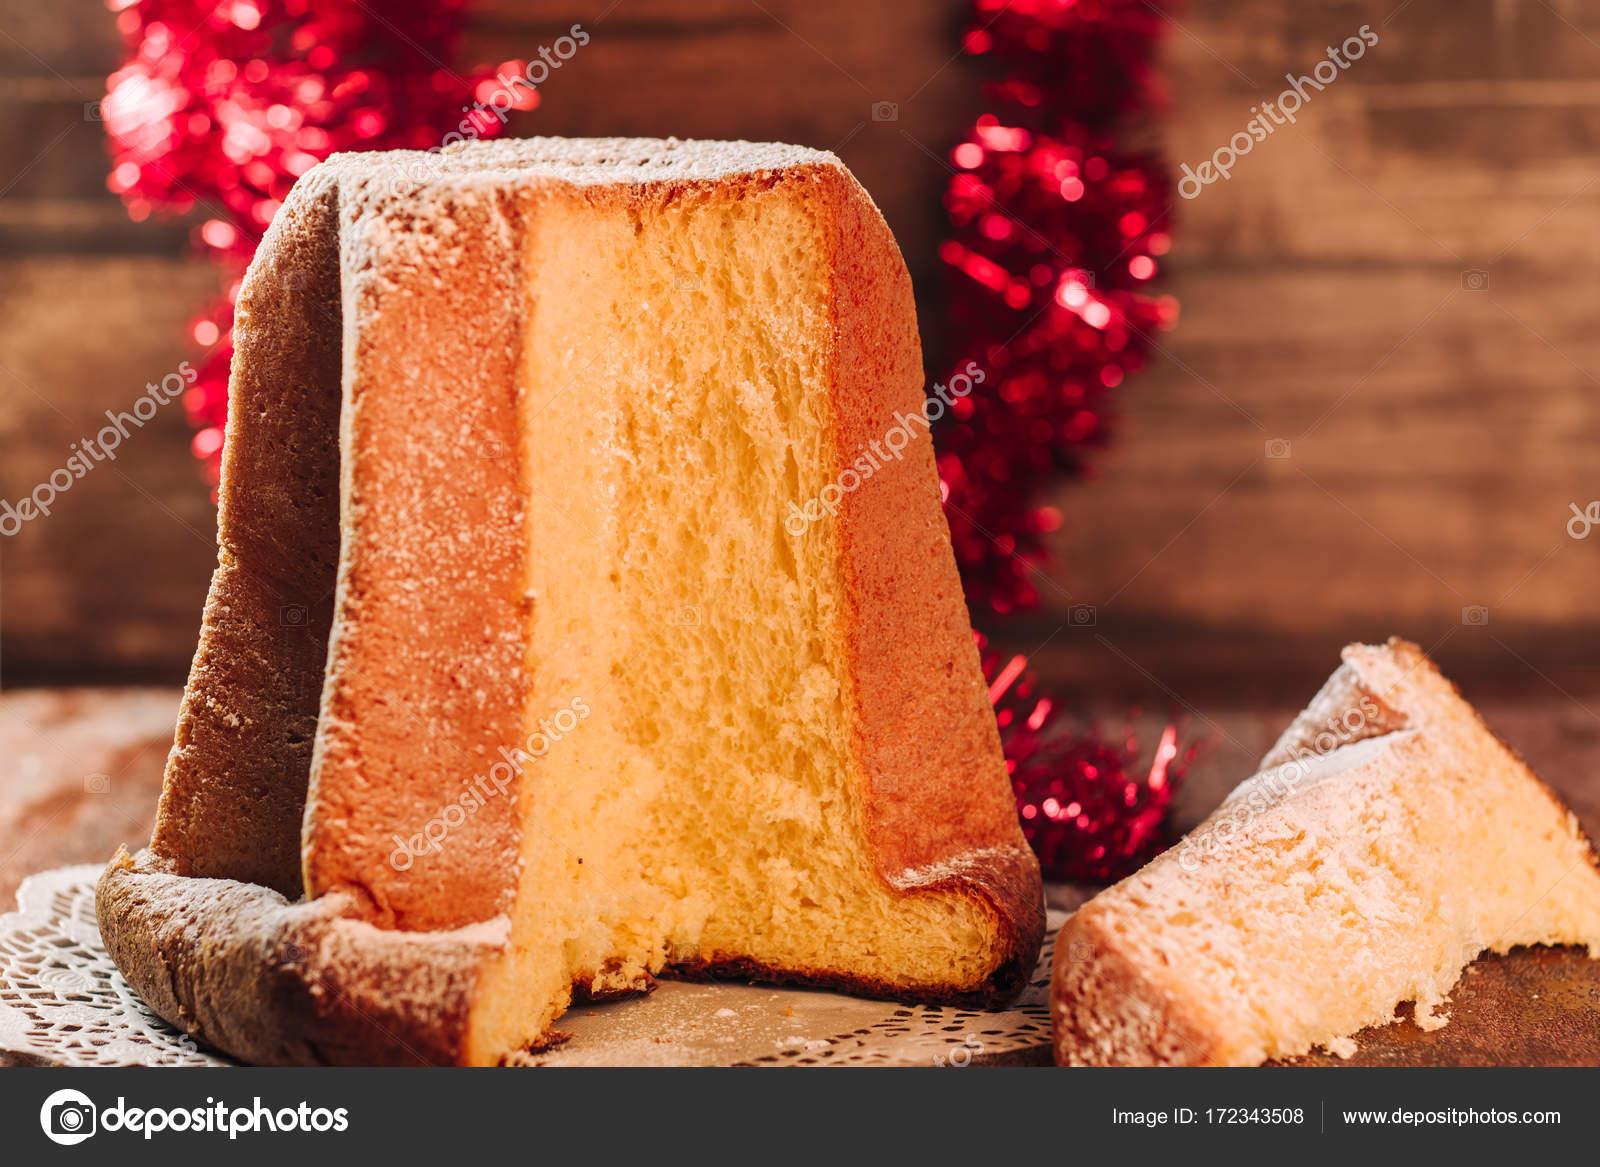 Italienische Pandoro Kuchen Stockfoto C Sabinoparente 172343508